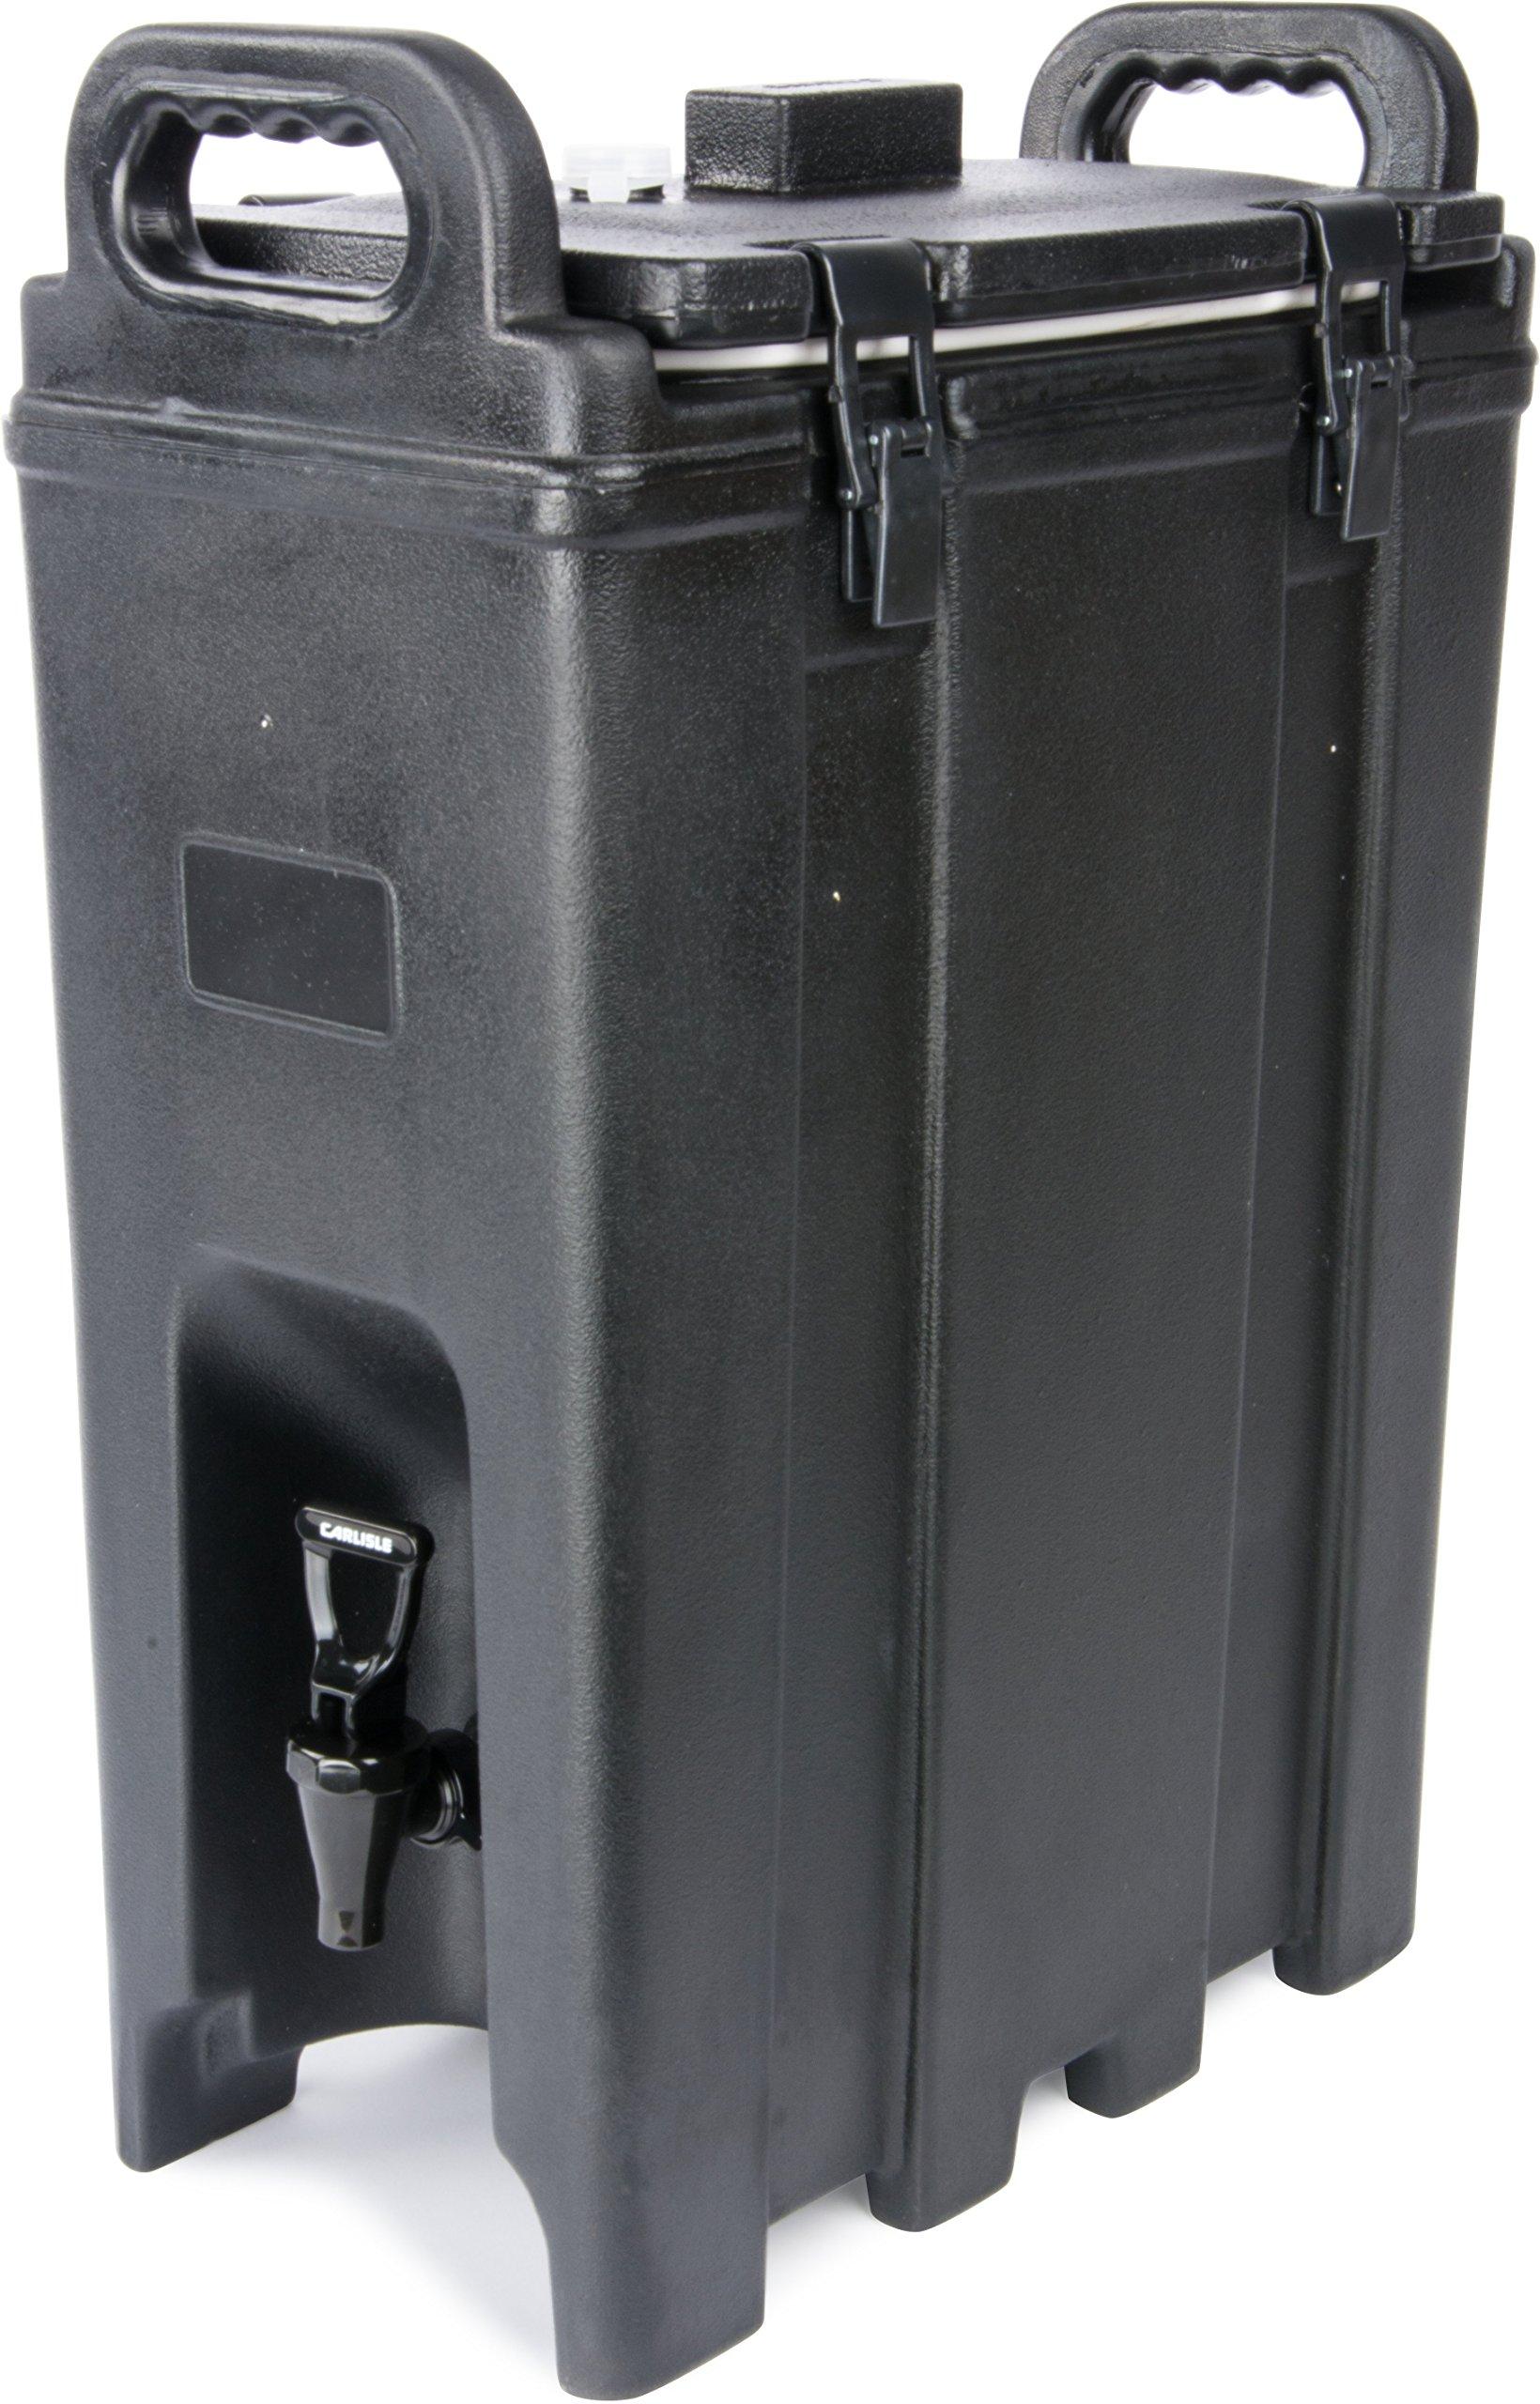 Carlisle LD500N03 Cateraide Polyethylene Insulated Beverage Server, 5 gal. Capacity, 16-3/8'' L x 9'' W x 24.20'' H, Black